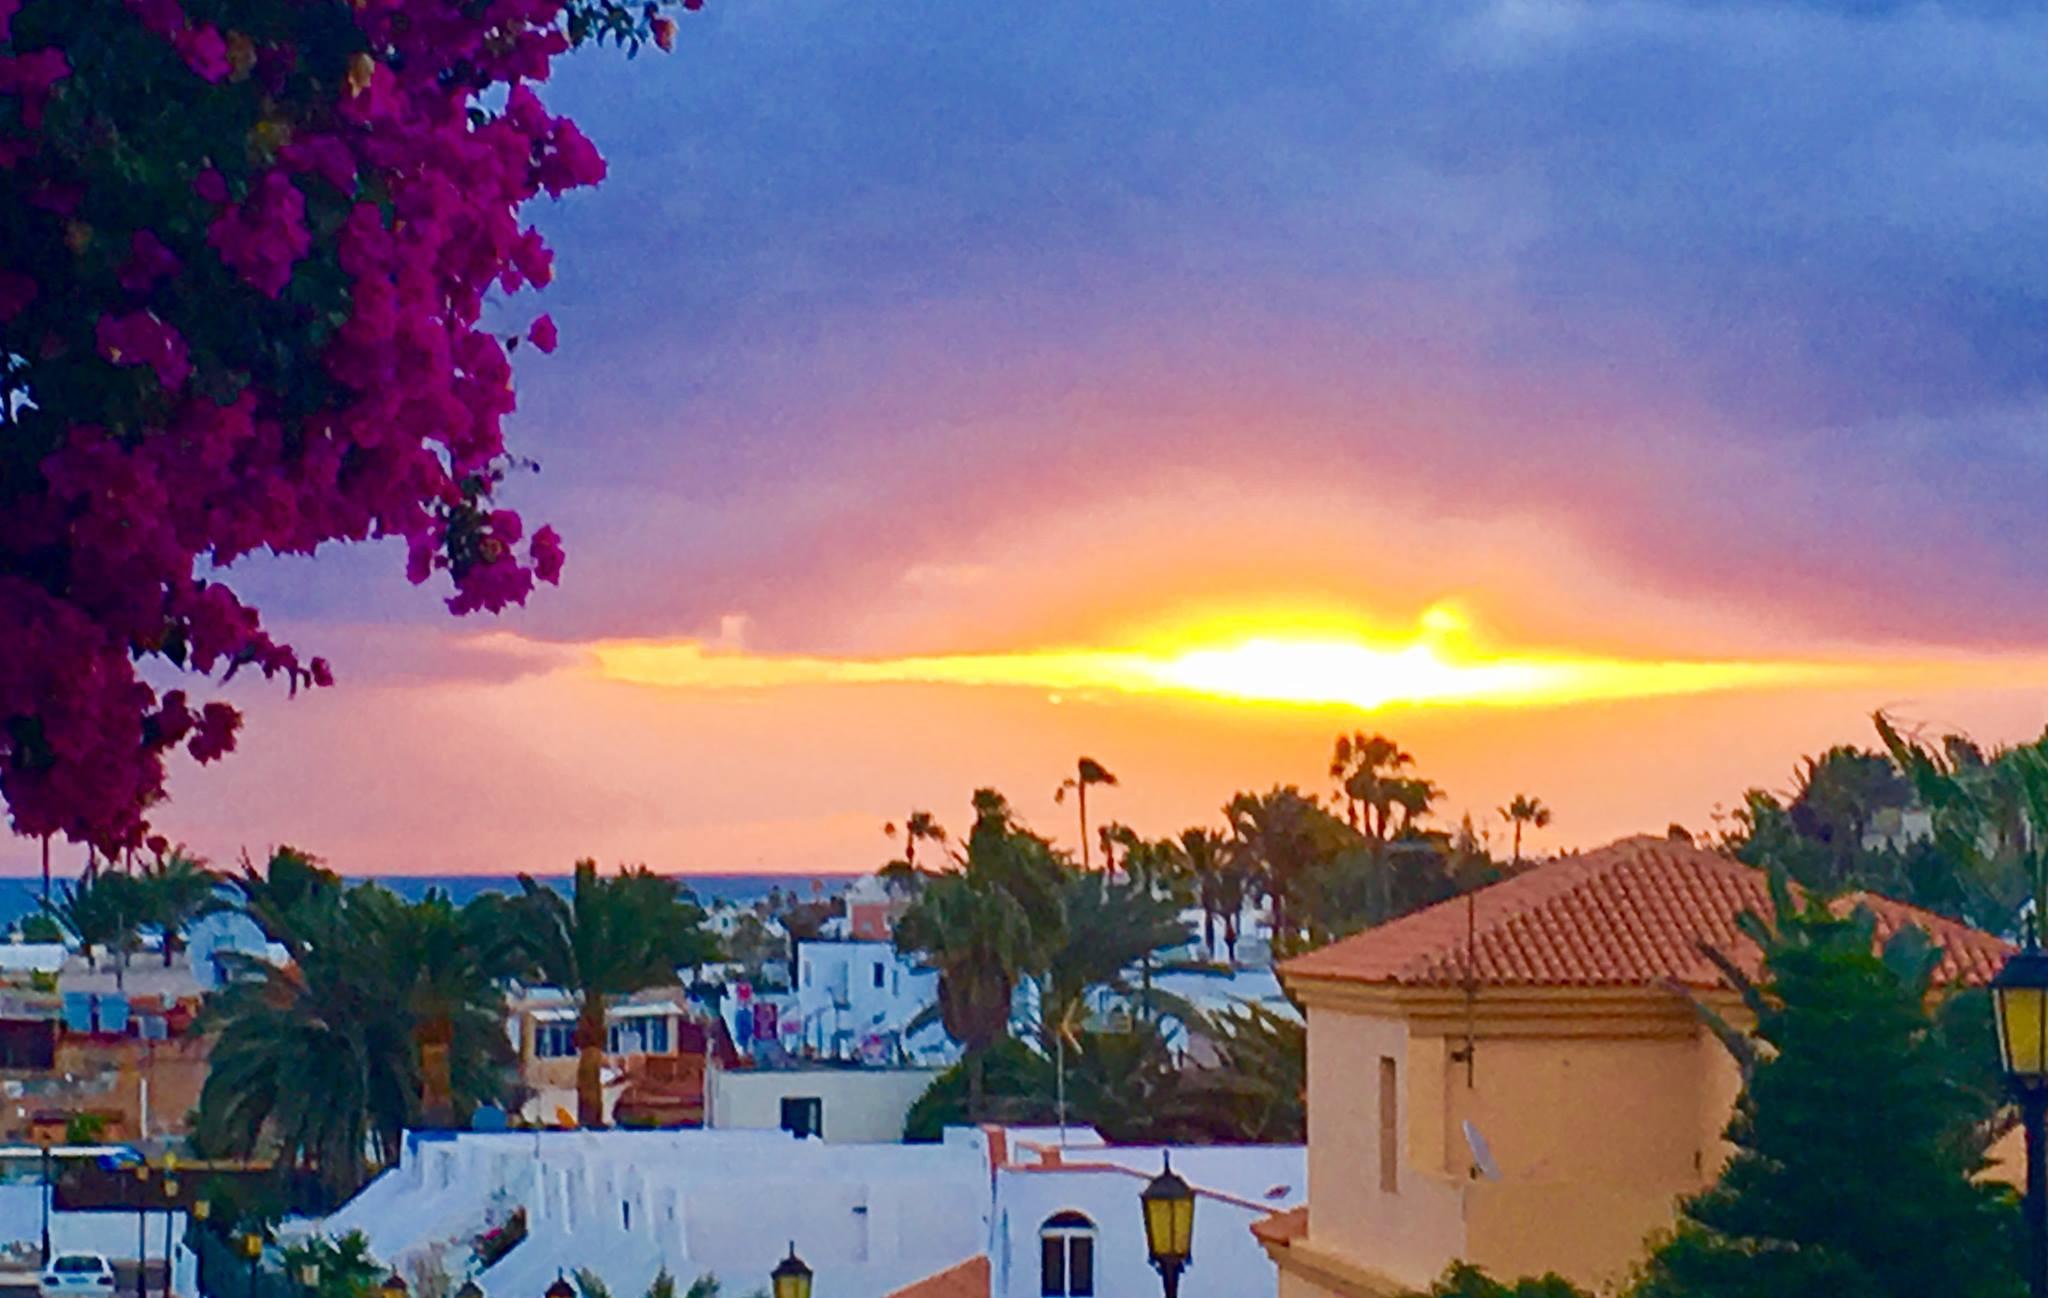 Pilates and Nutrition Retreat in Fuerteventura, 13th – 20th October